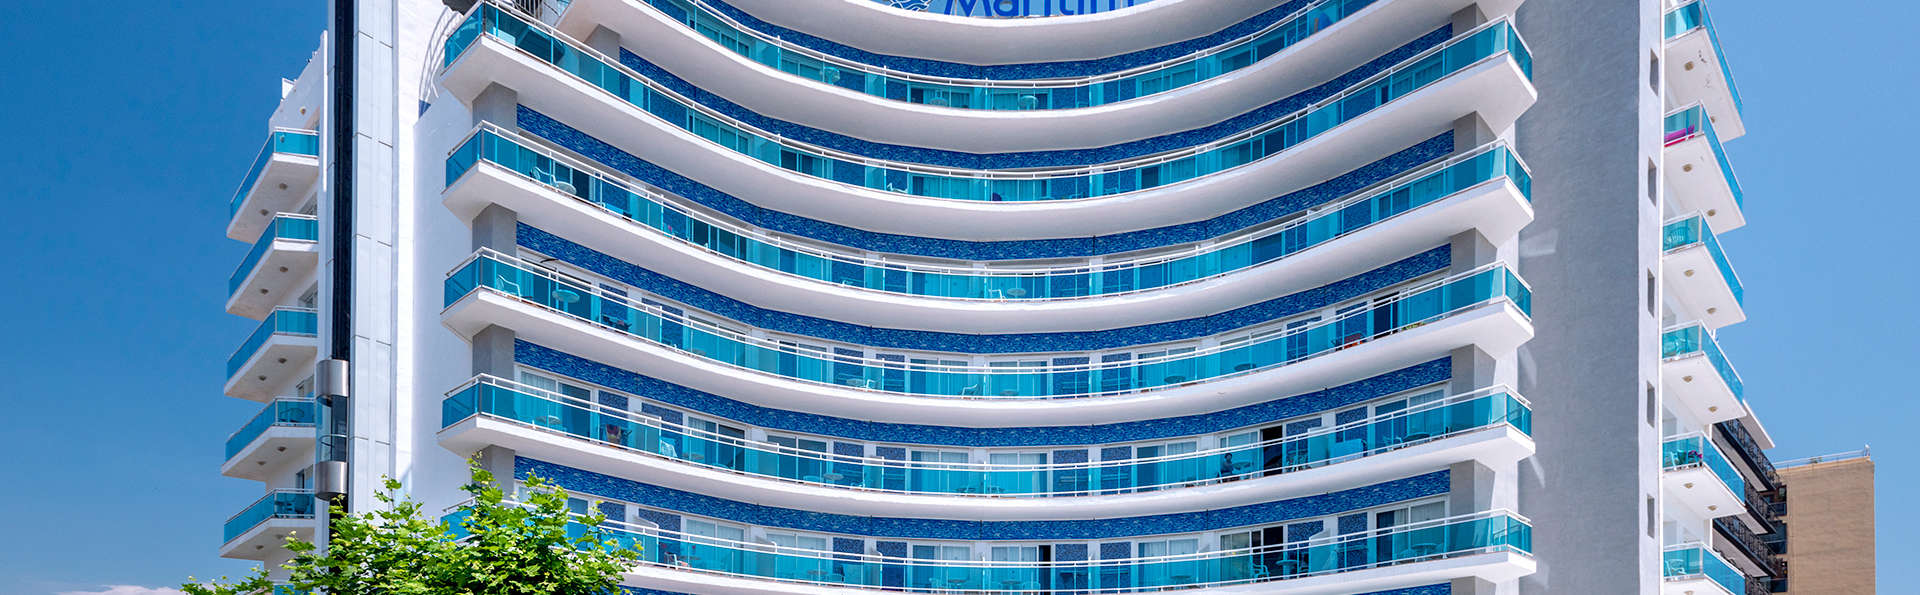 Hotel GHT Maritim - EDIT_NEW_FRONT3.jpg